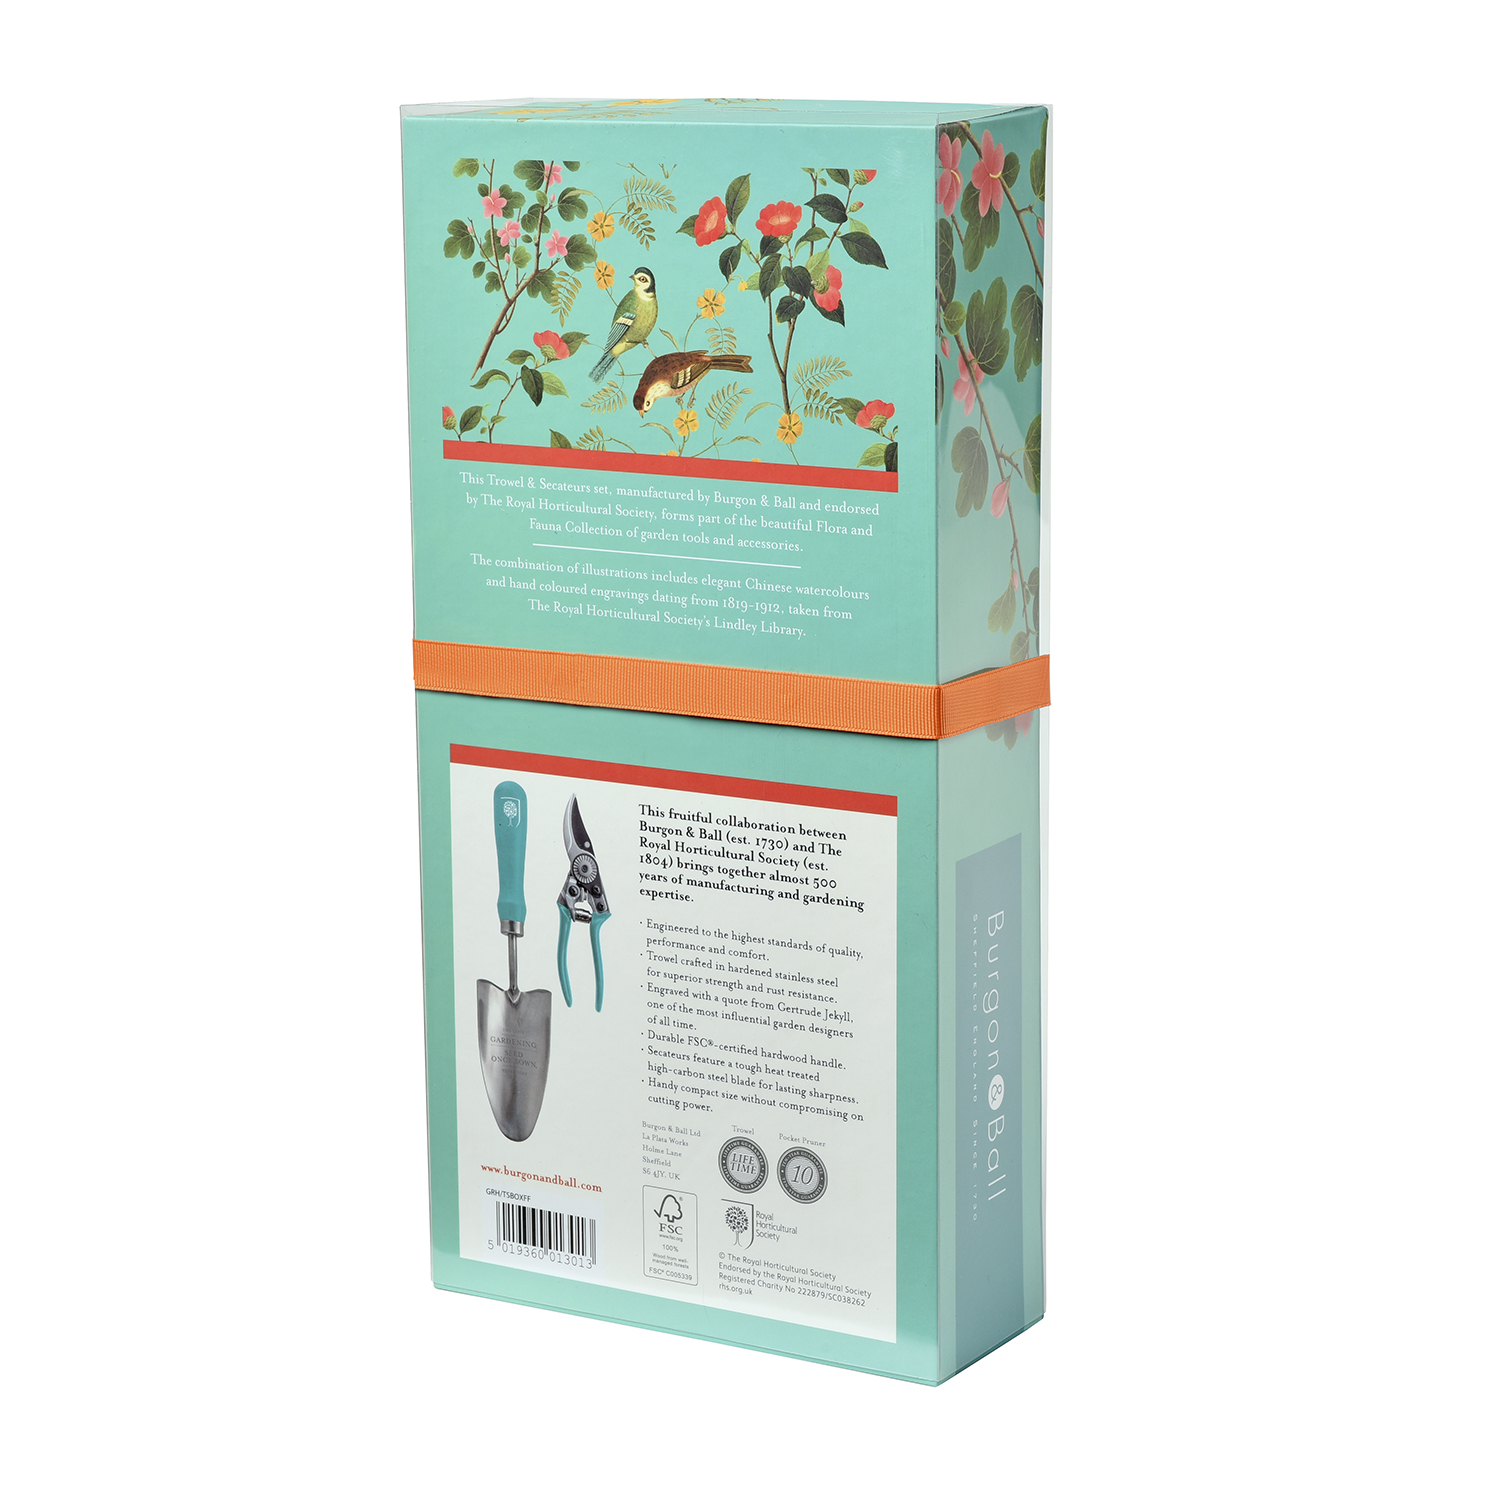 Burgon & Ball – RHS Flora and Fauna Trowel & Secateurs Set in Gift Box